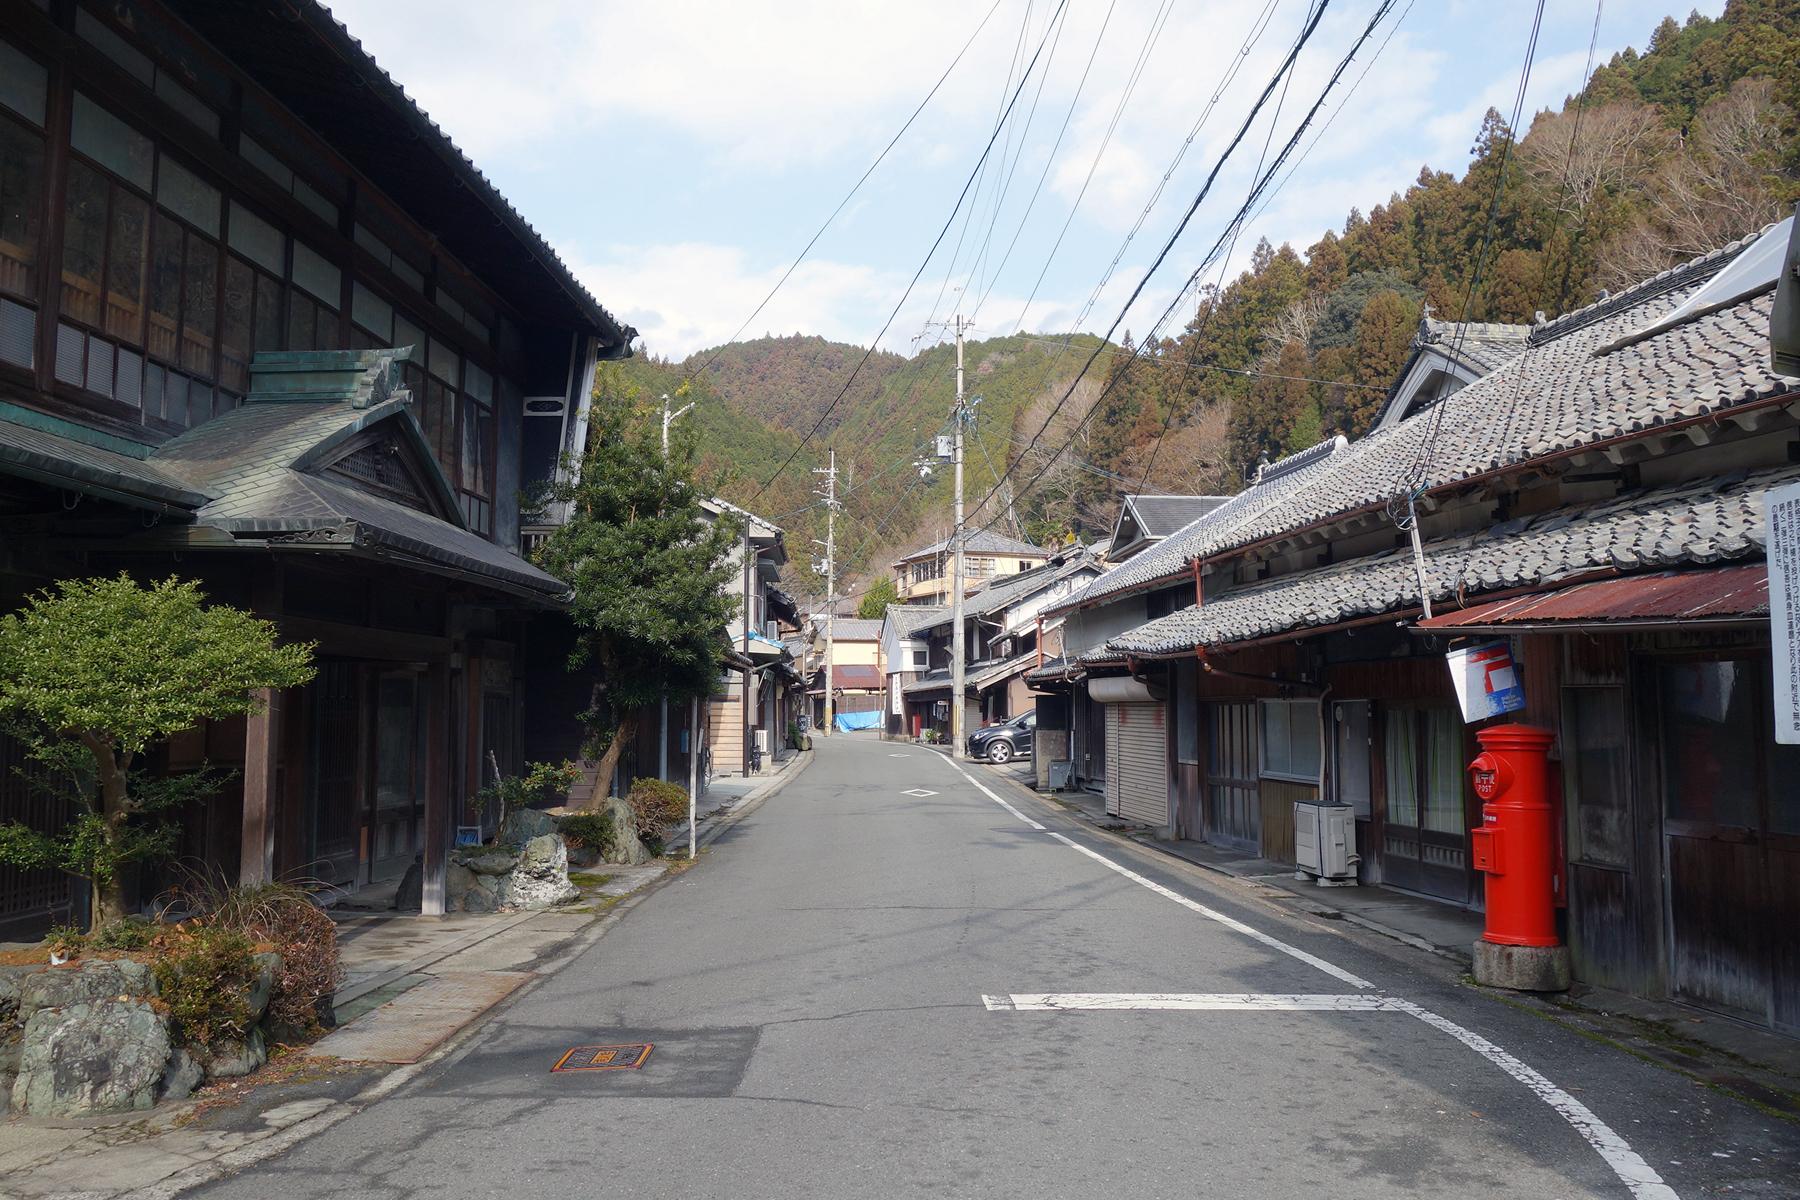 Old wooden houses line the main street running through Higashiyoshino Village, Nara Prefecture.   ALEX K.T. MARTIN